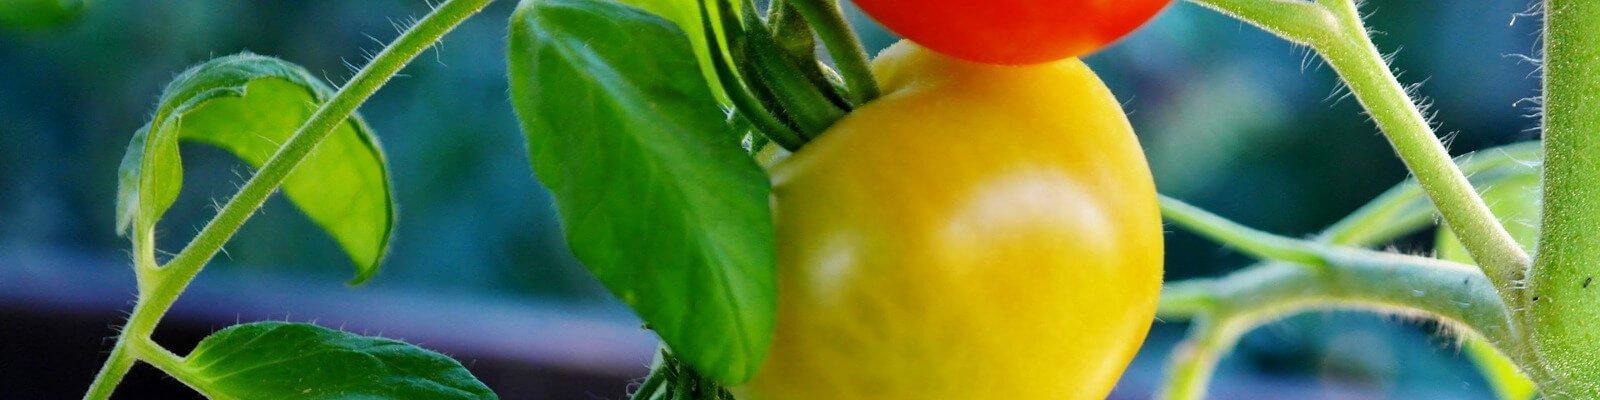 tomaten z chten verbesserte tomatensorten dank f1 z chtung. Black Bedroom Furniture Sets. Home Design Ideas